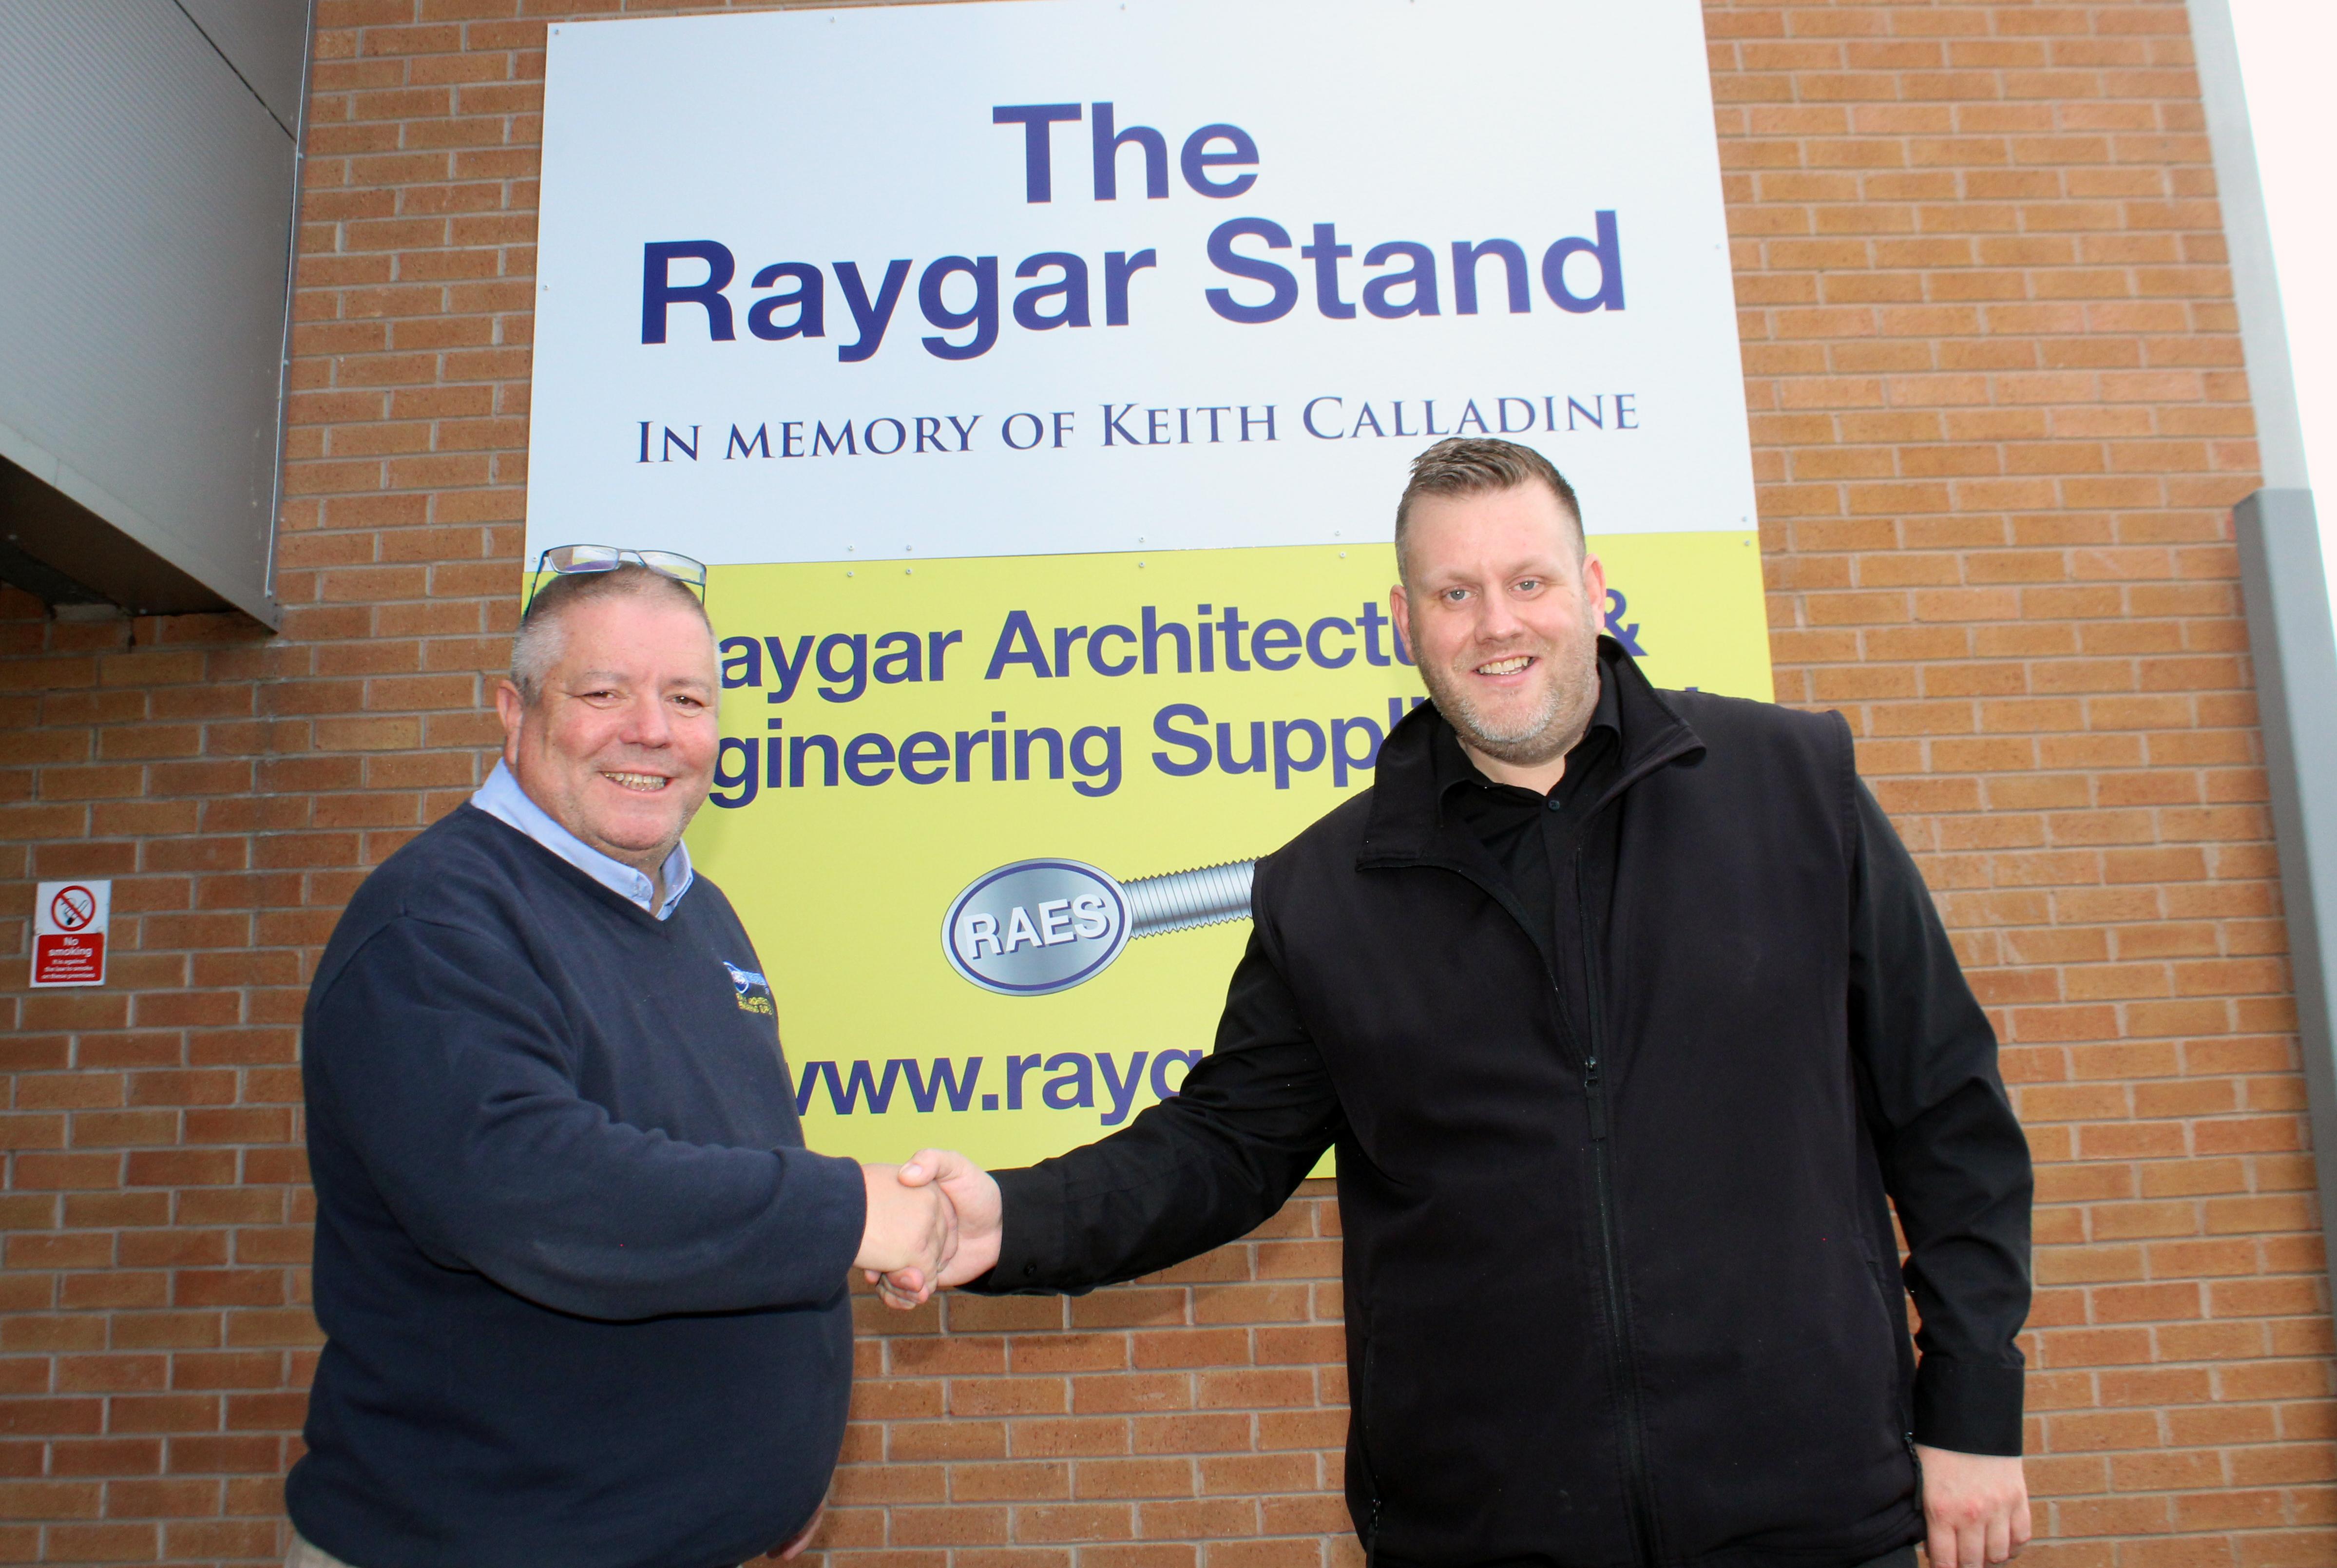 Raygar's sponsorship football boards installed at the Pirelli Stadium